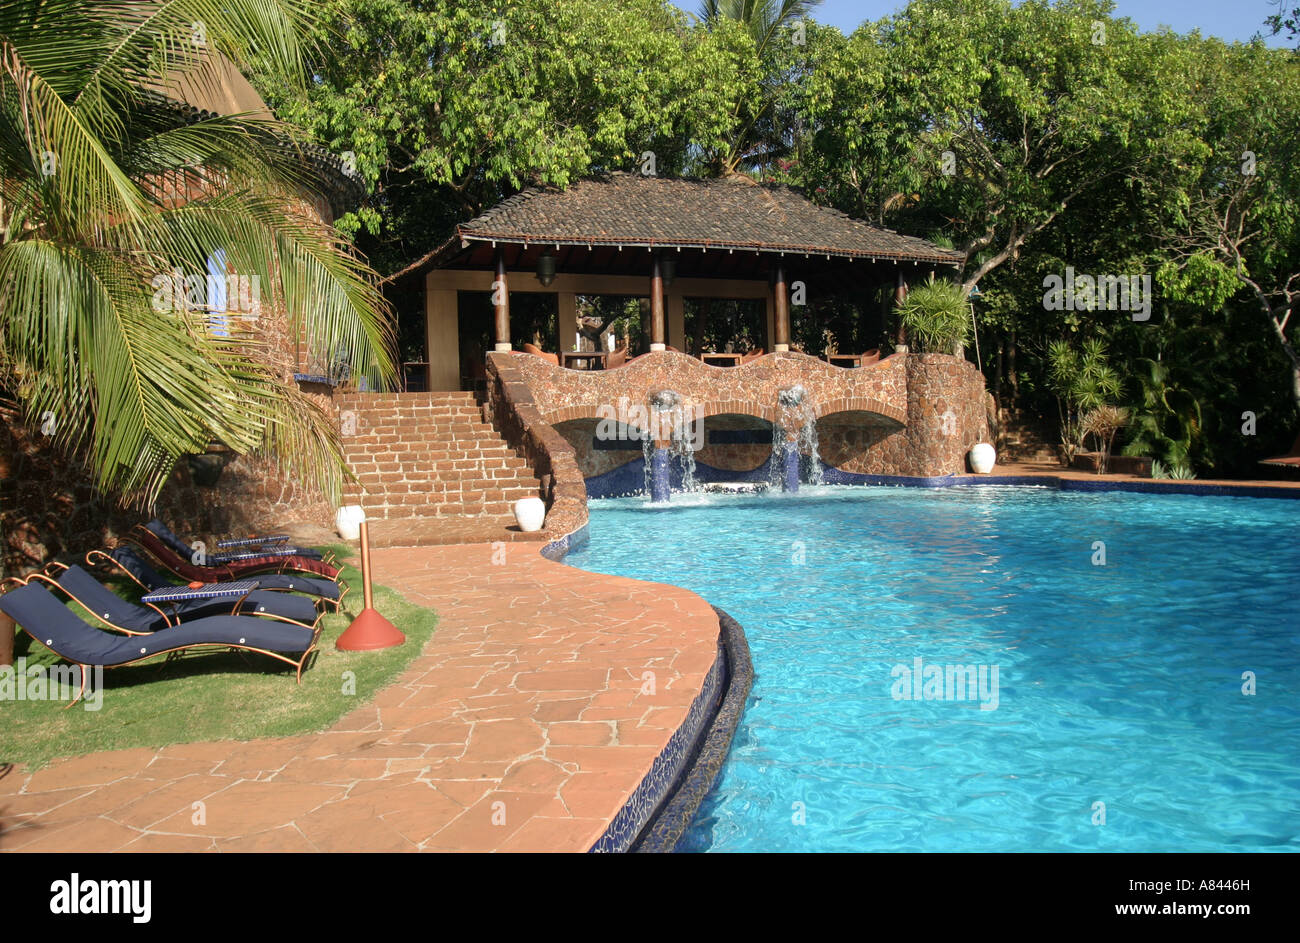 Piscina dalle forme libere all'spectaculary progettato Nilaya Hermitage boutique hotel in Goa in India Immagini Stock